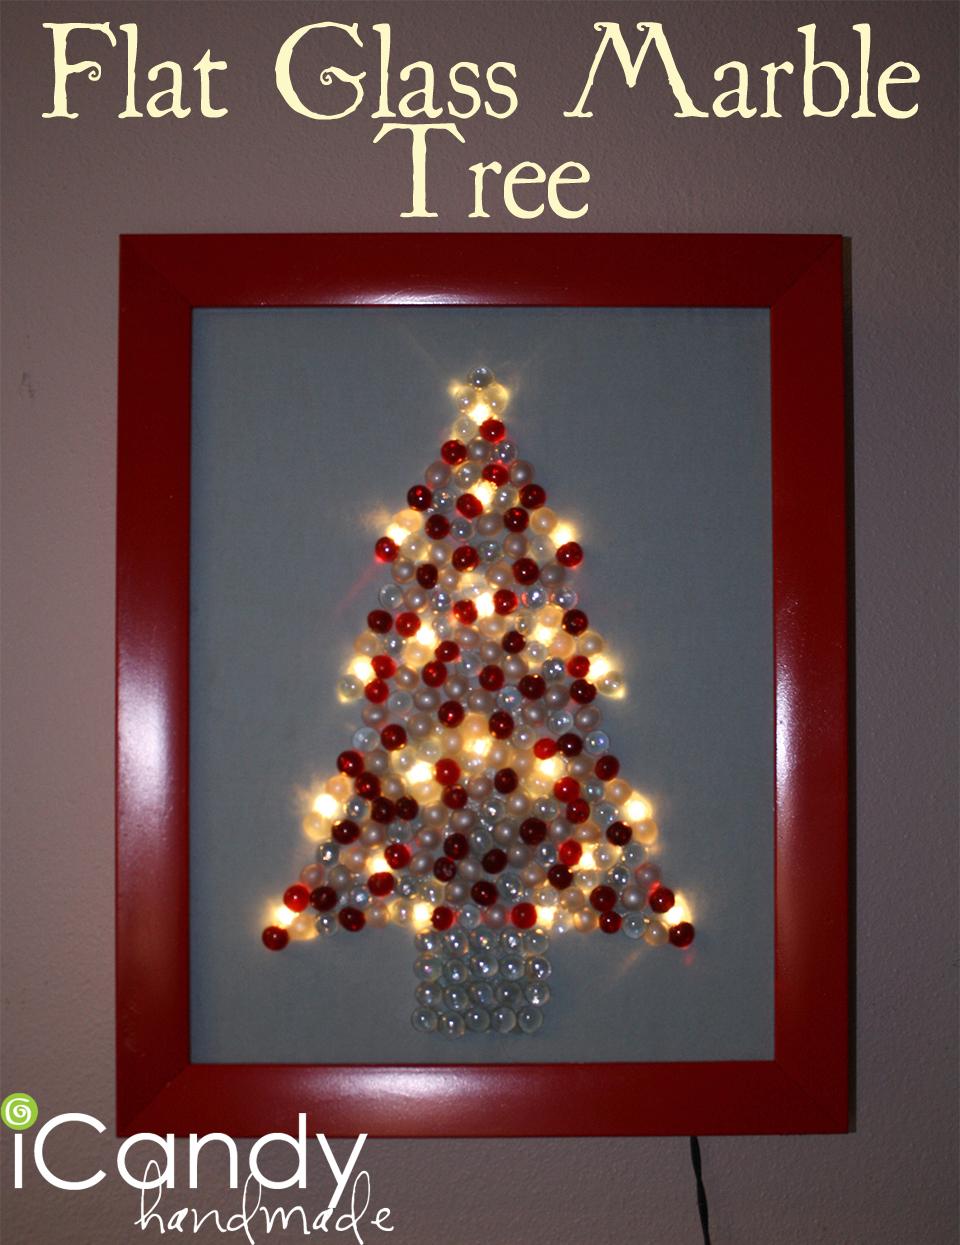 Flat Glass Marble Tree